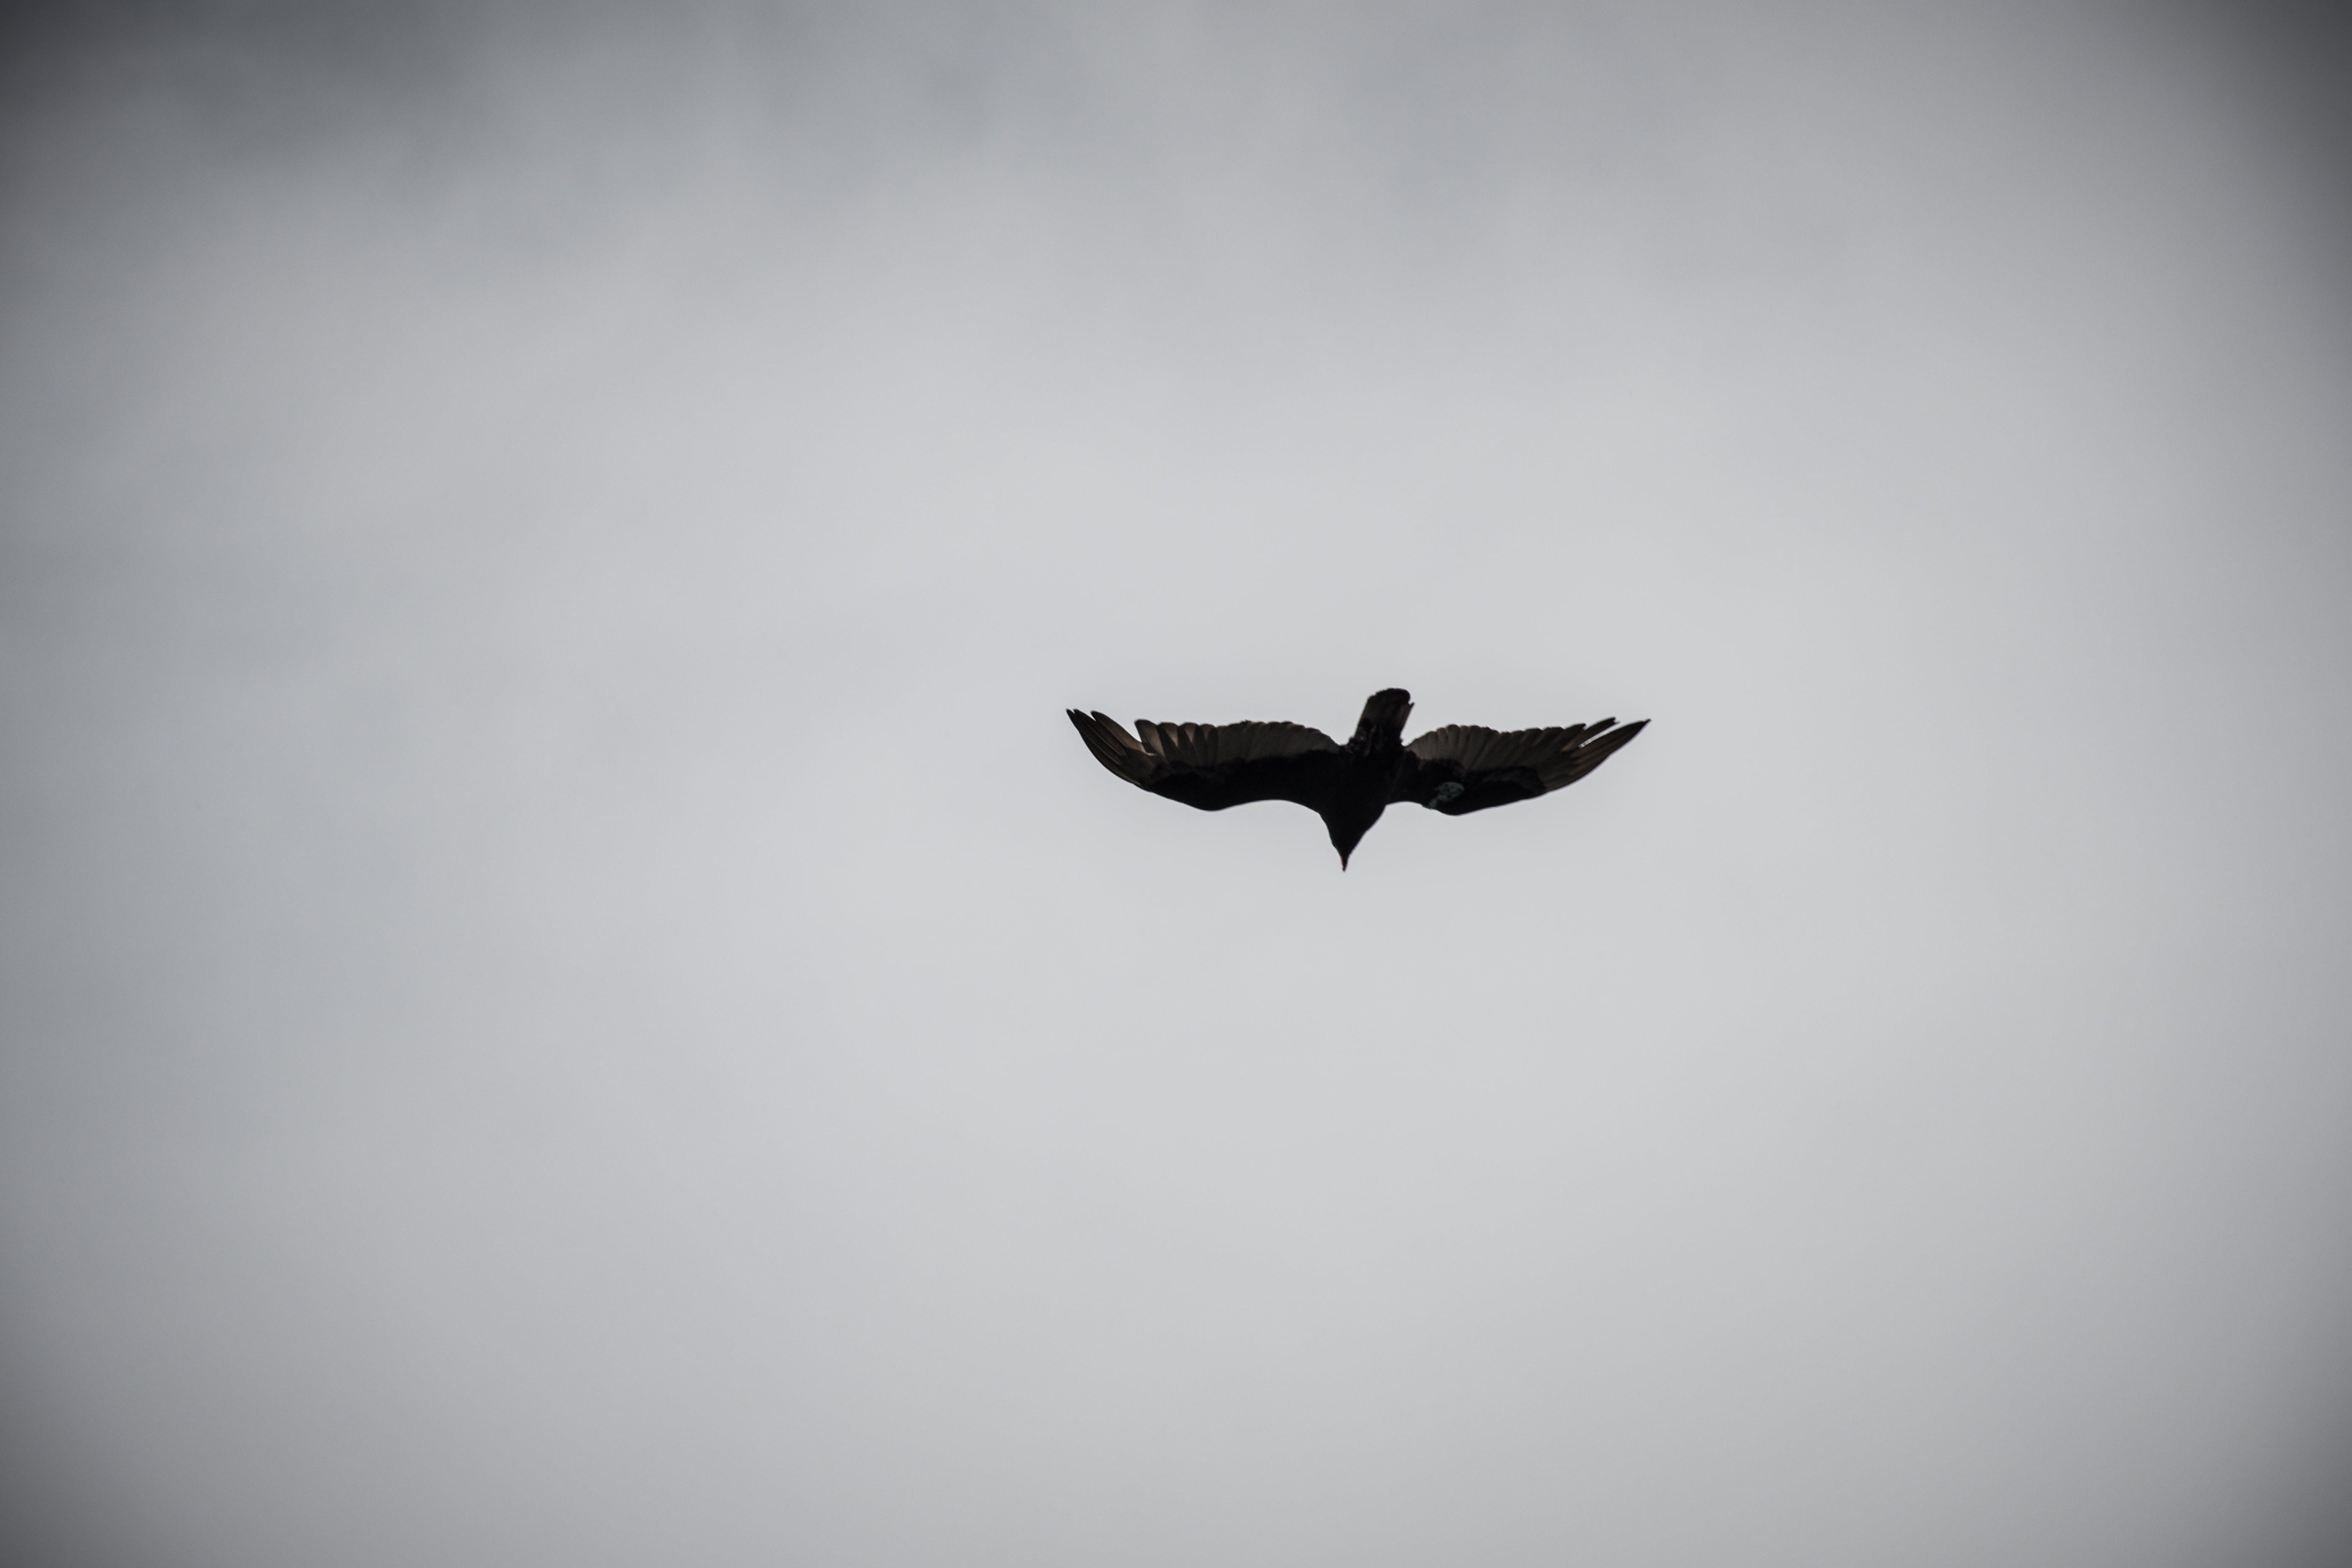 Foto stok gratis binatang, burung elang, burung pemangsa, hewan pemangsa